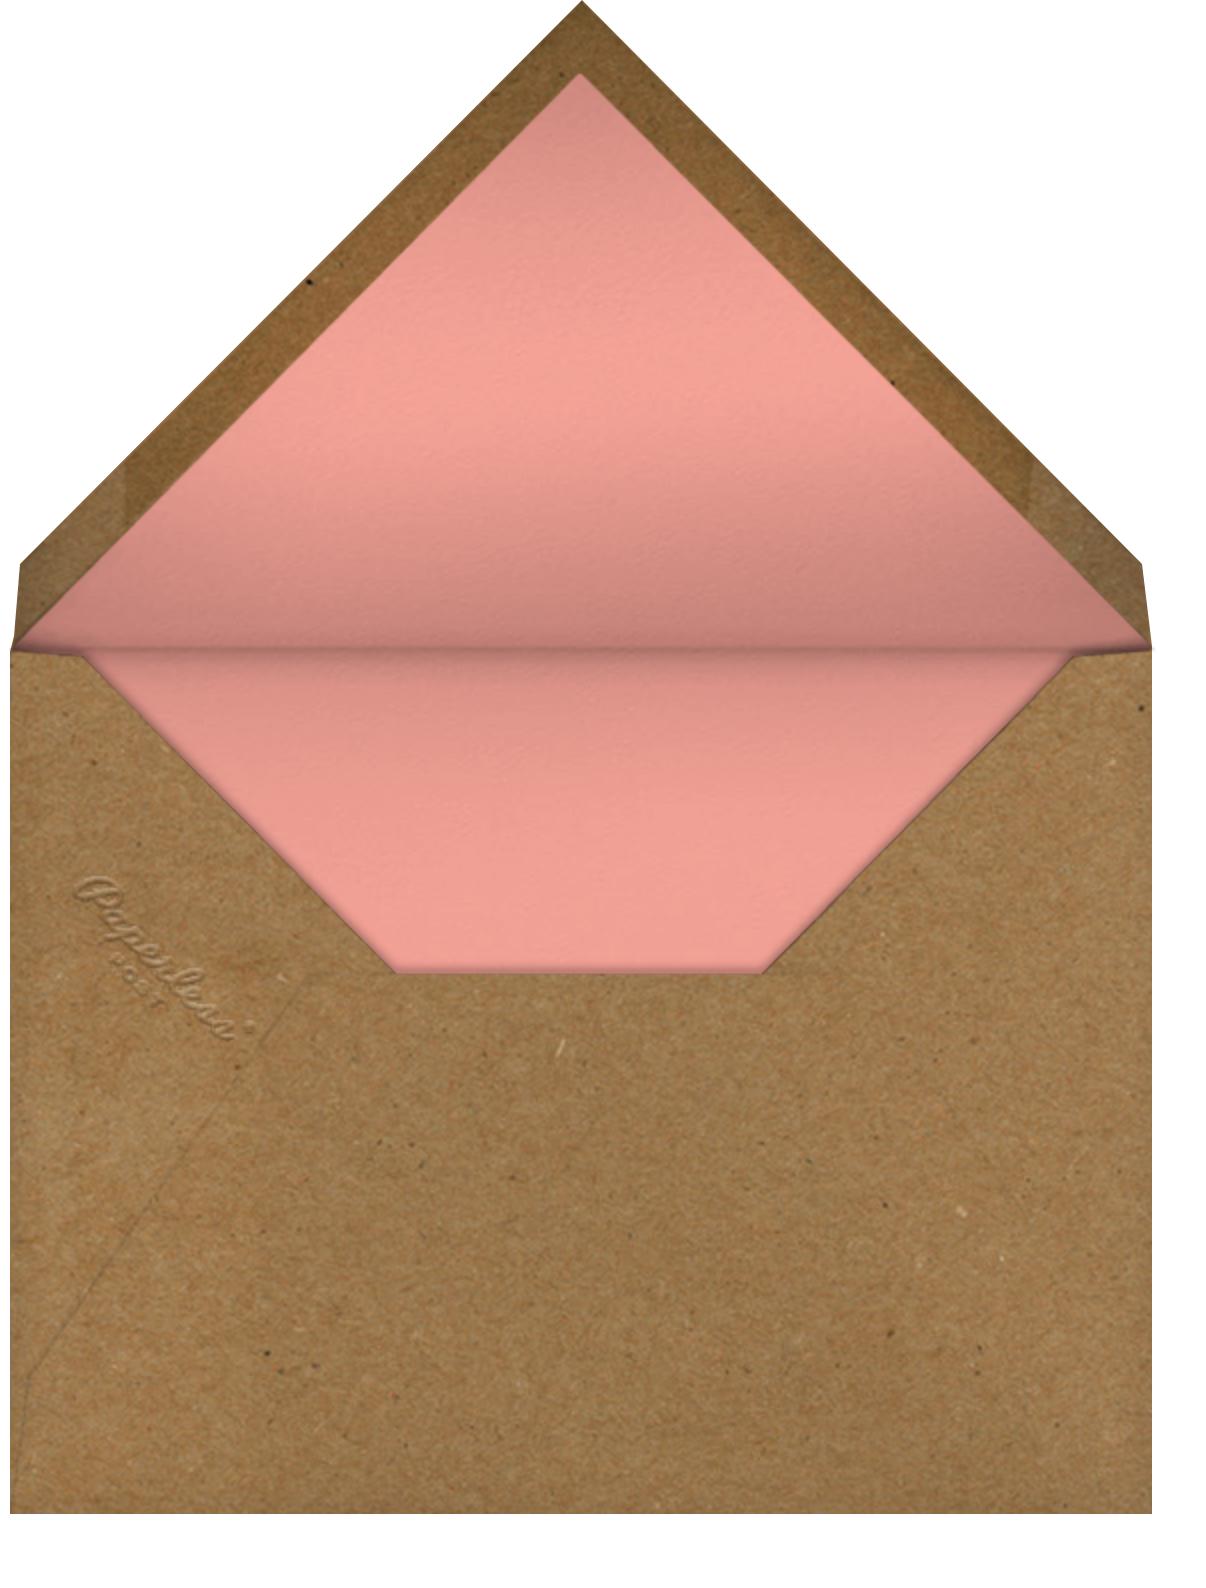 Teacup Cat (Anke Weckmann) - Red Cap Cards - Cameo - envelope back